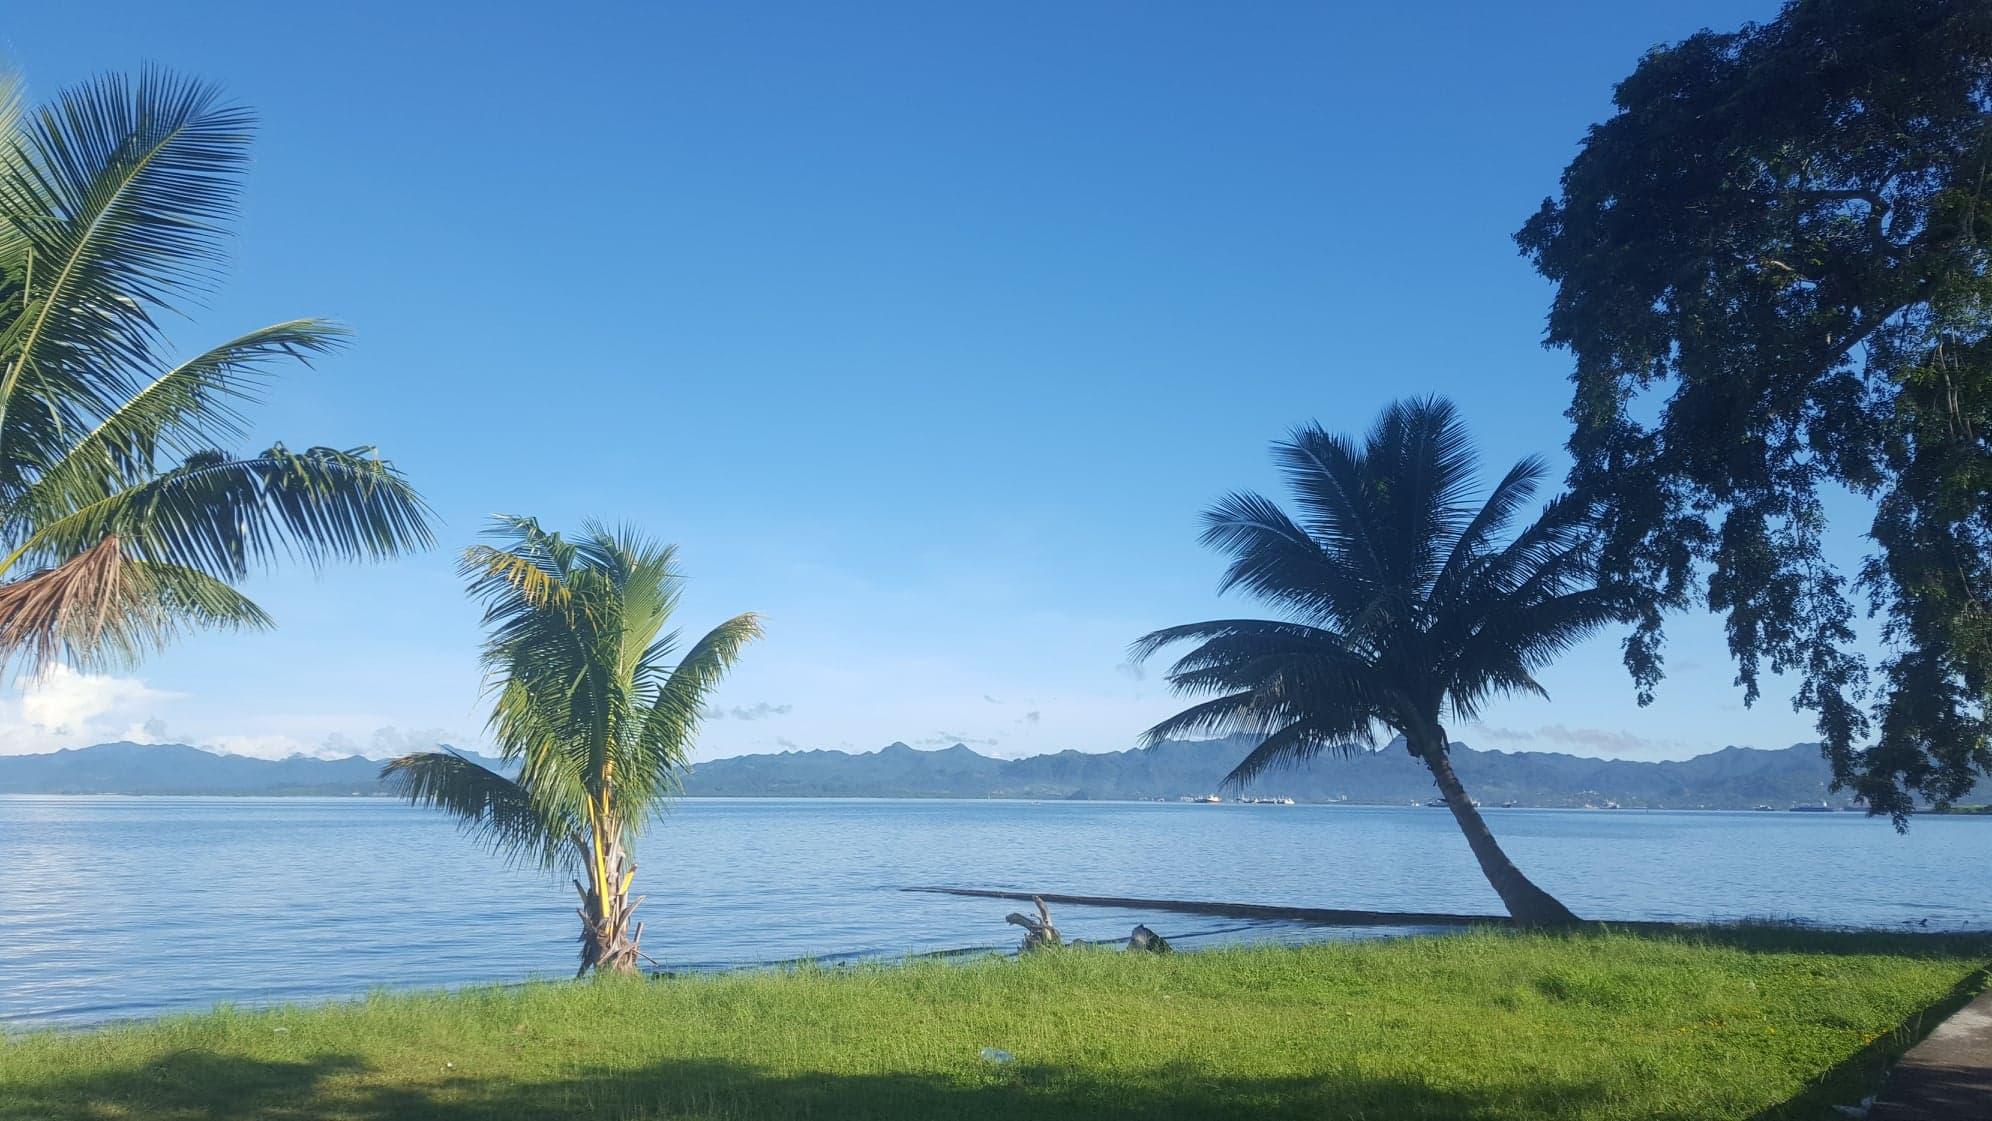 Casual clichéd view of the South Sea Beaches. Photo credit Hery Ramambasoa.